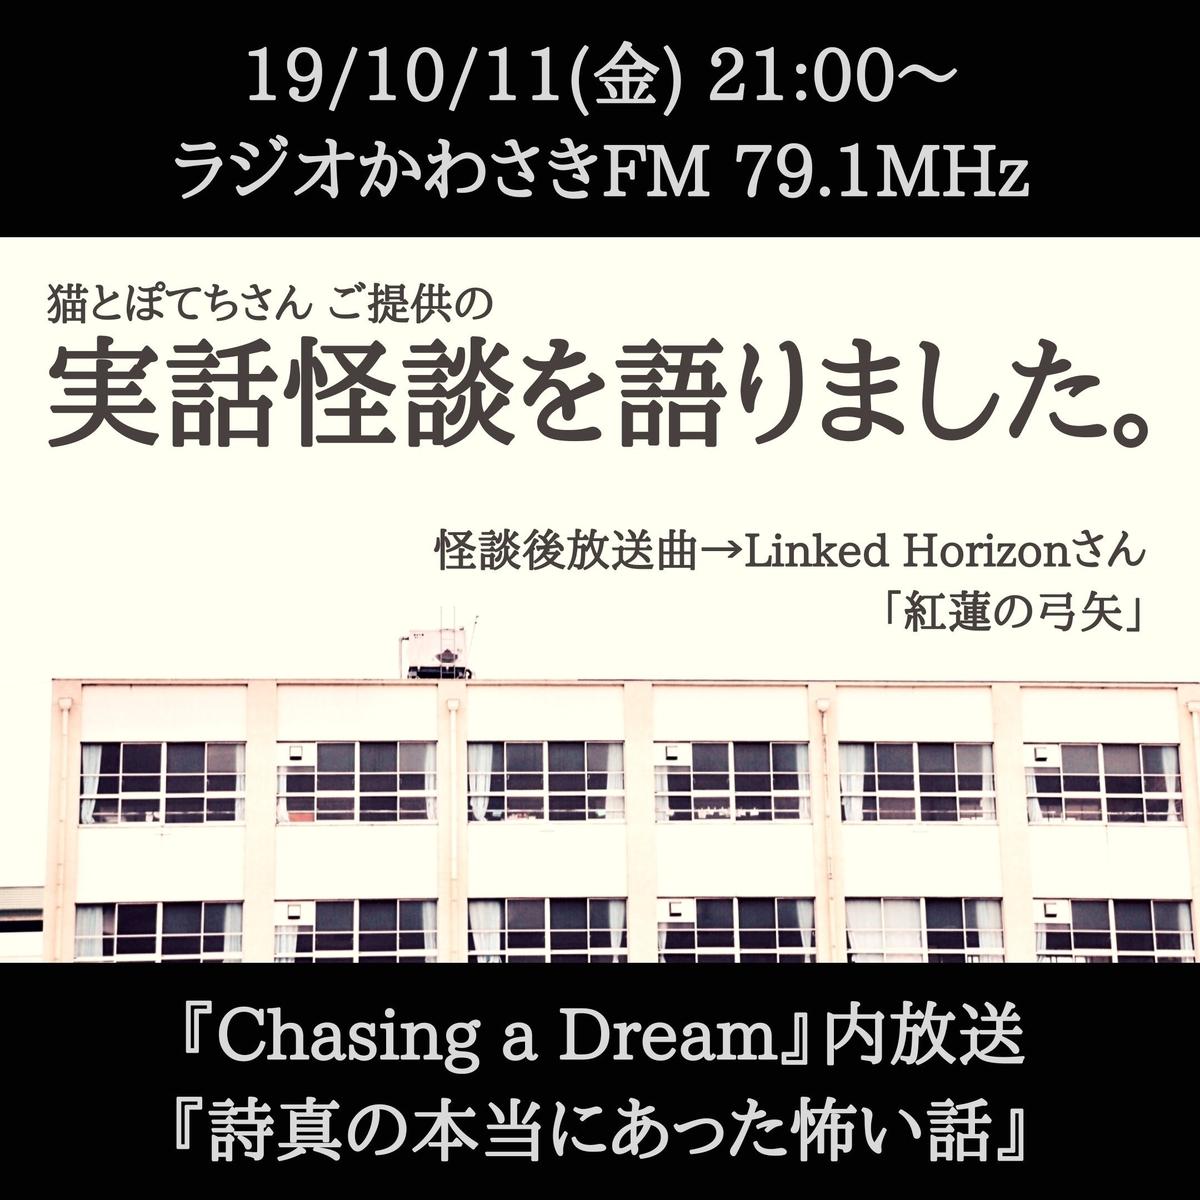 f:id:yukaitekietsu:20191018212805j:plain